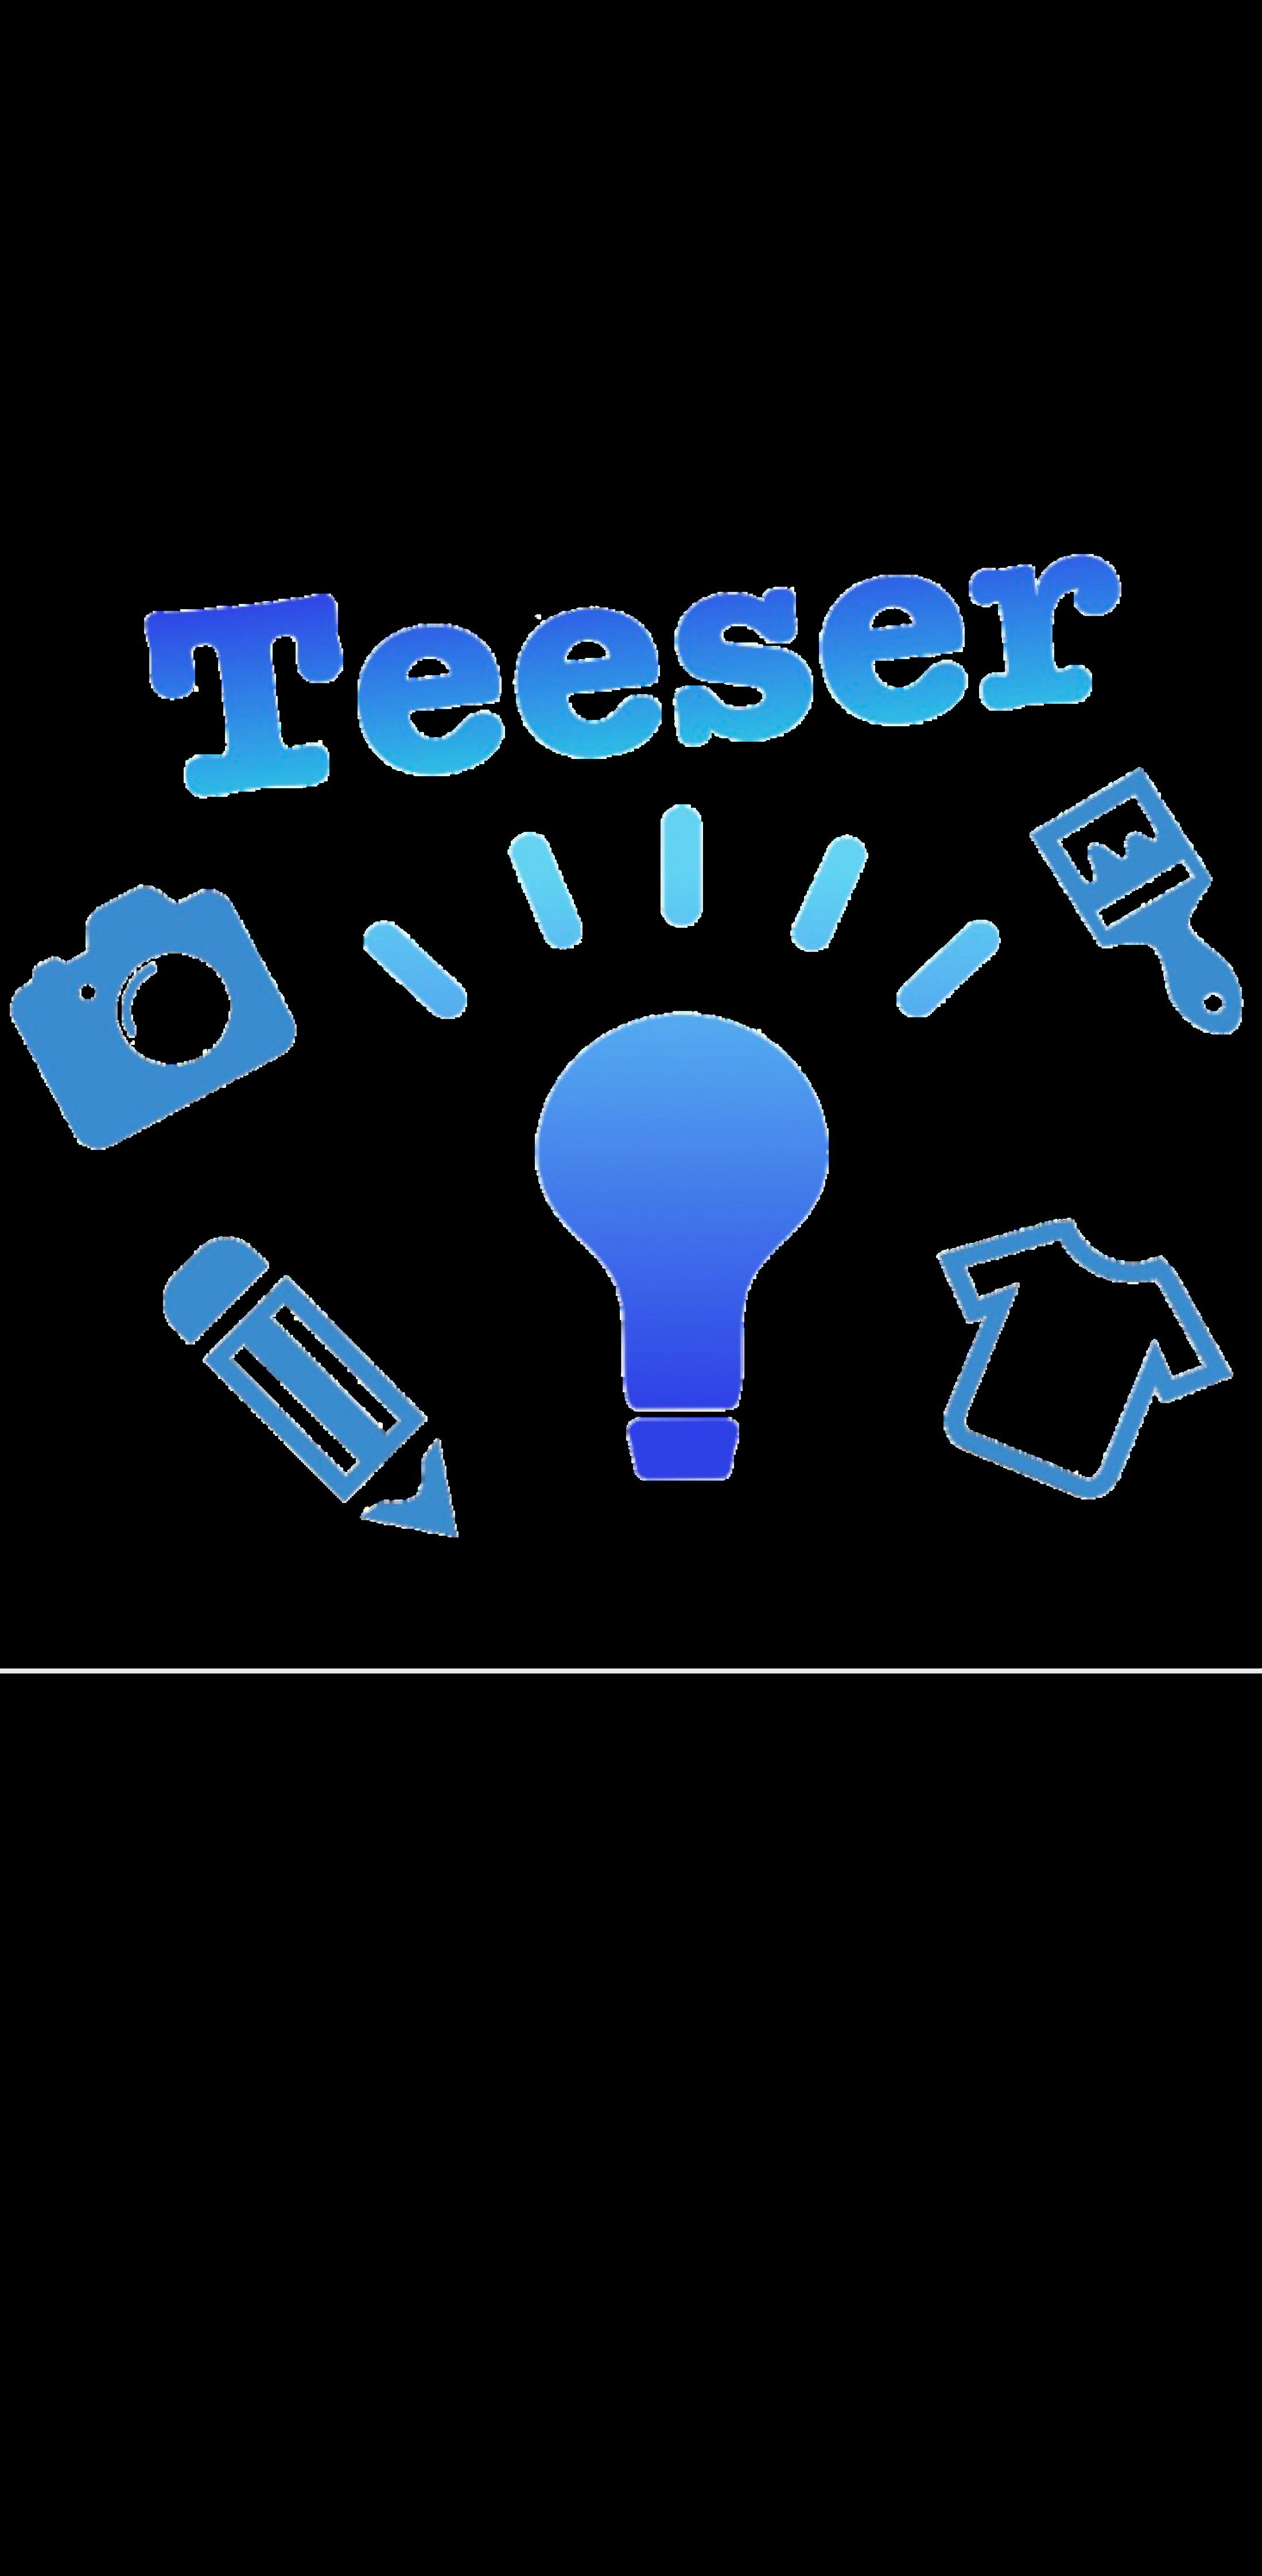 cover Contest Logo Teeser